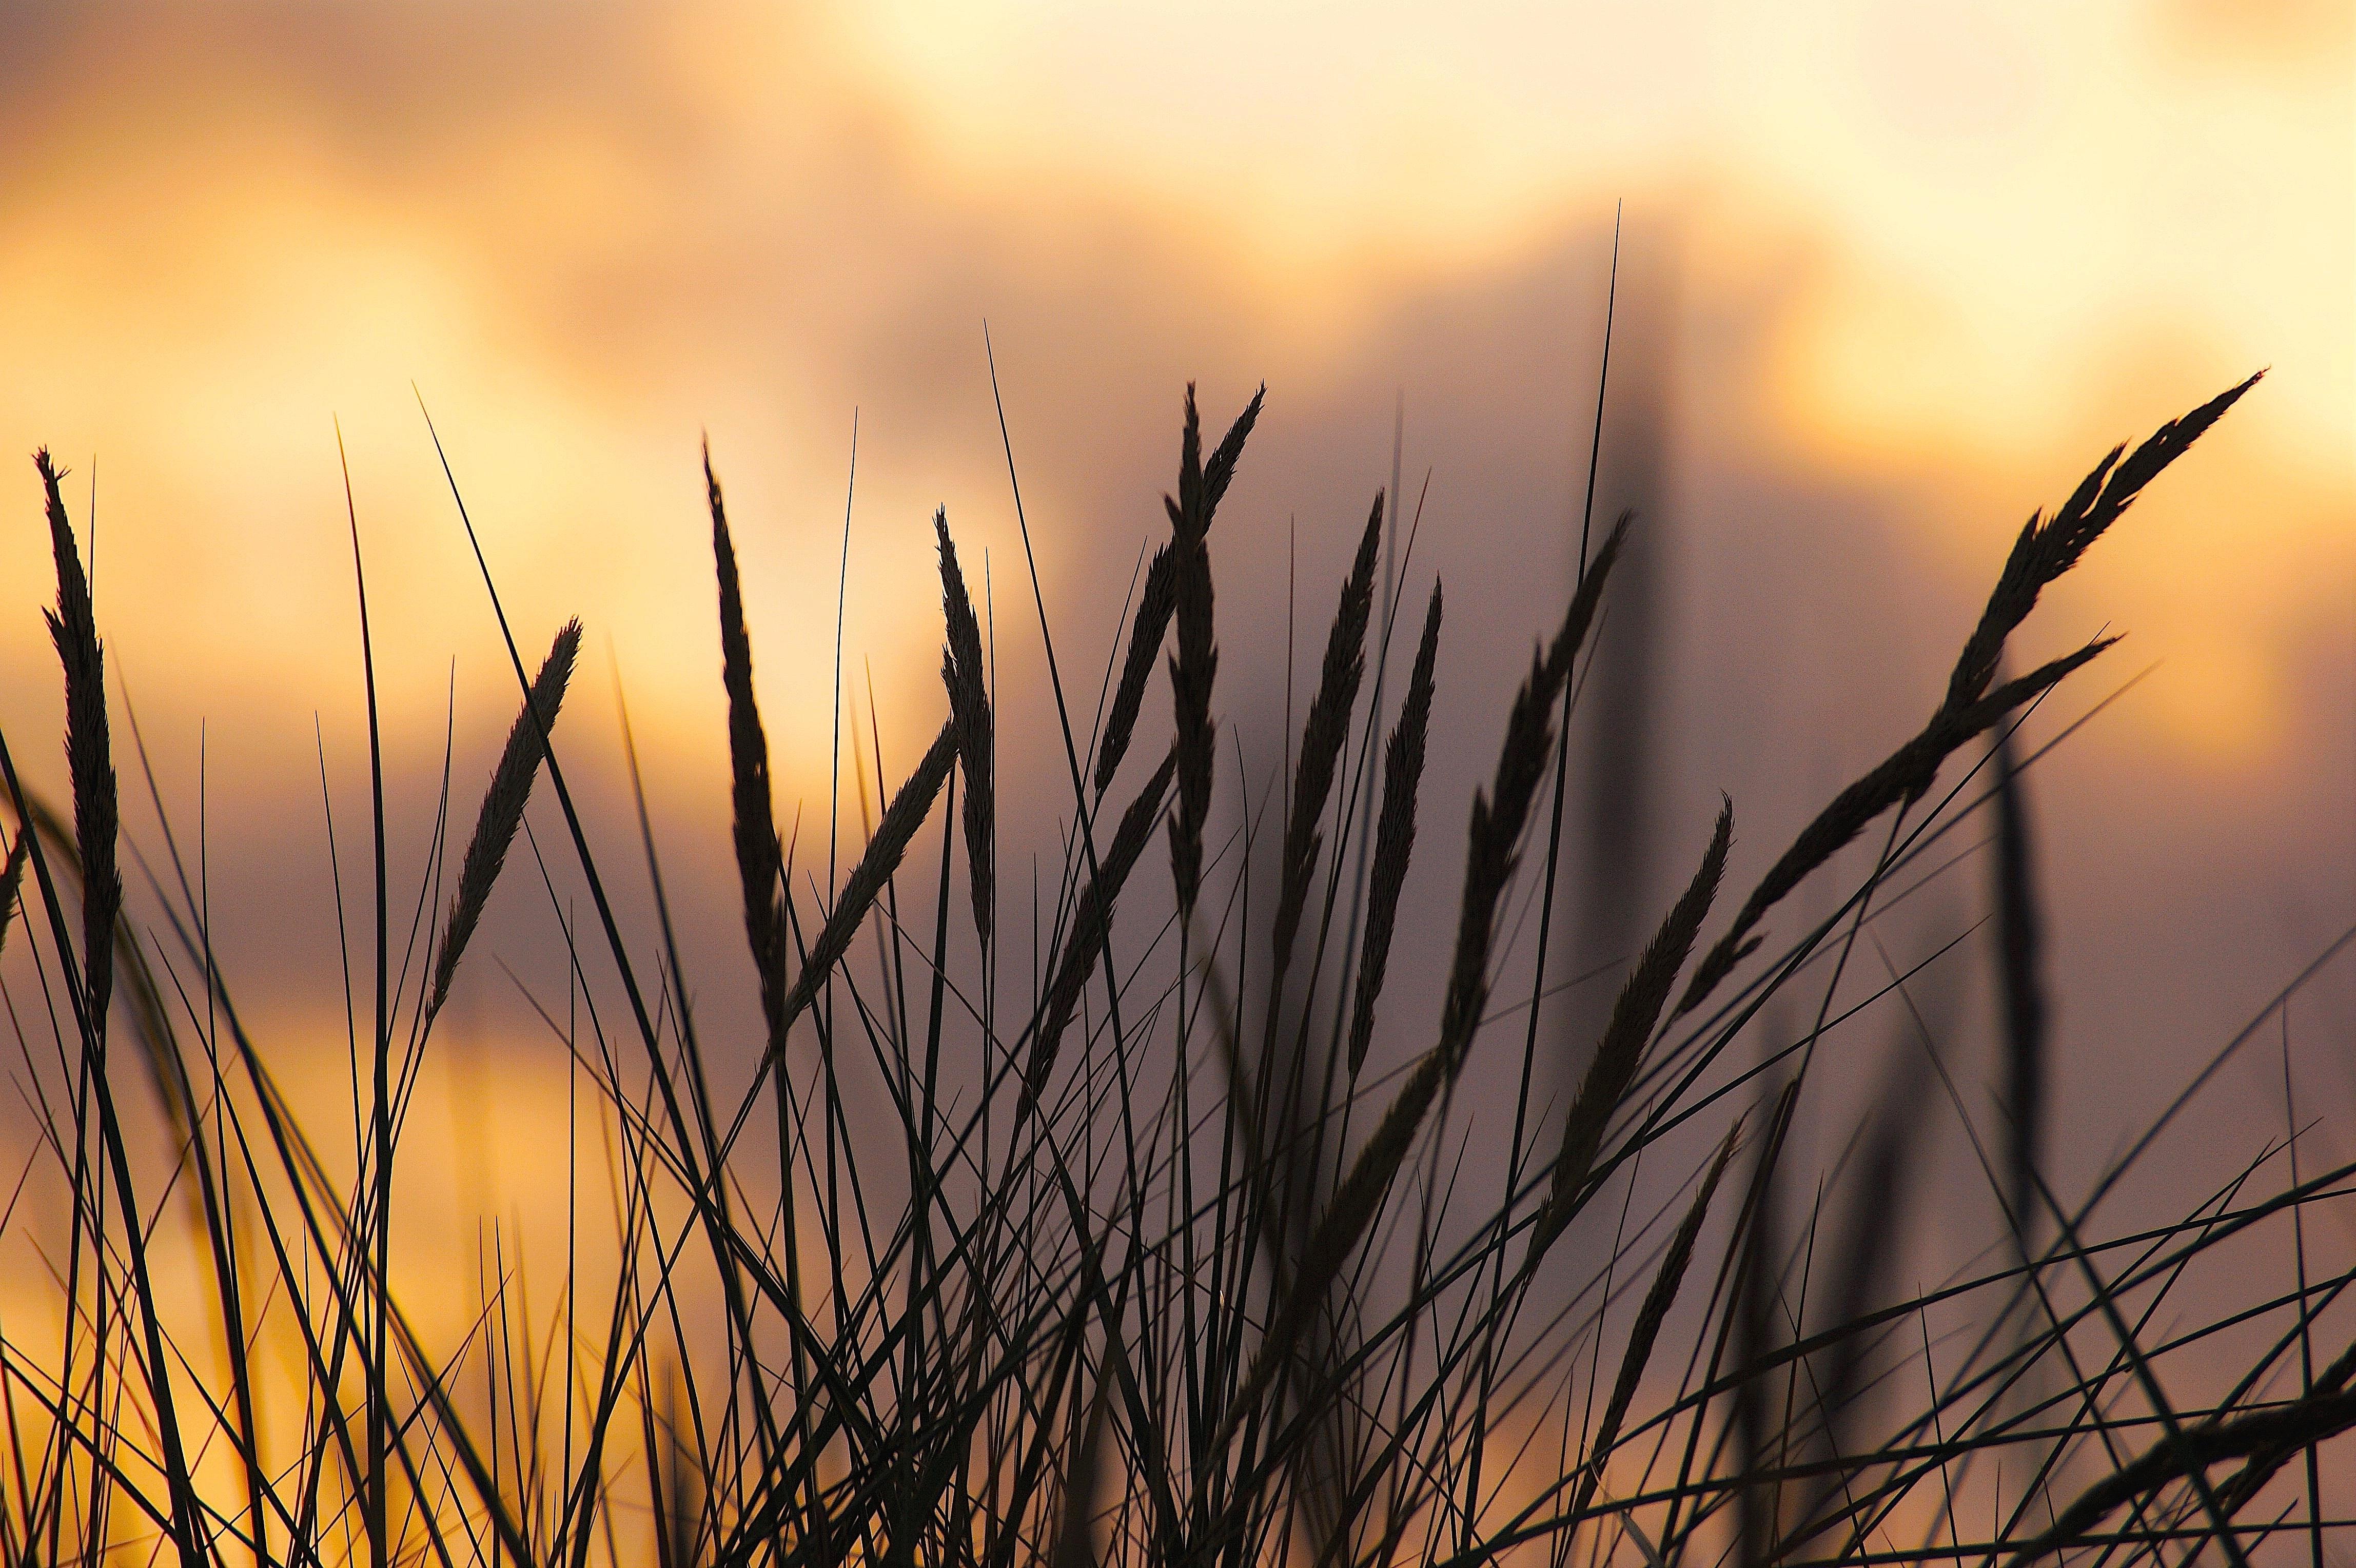 Silhouette Photo of Wheat during Sunset, Abendstimmung, Sunset, Sunlight, Summer, HQ Photo